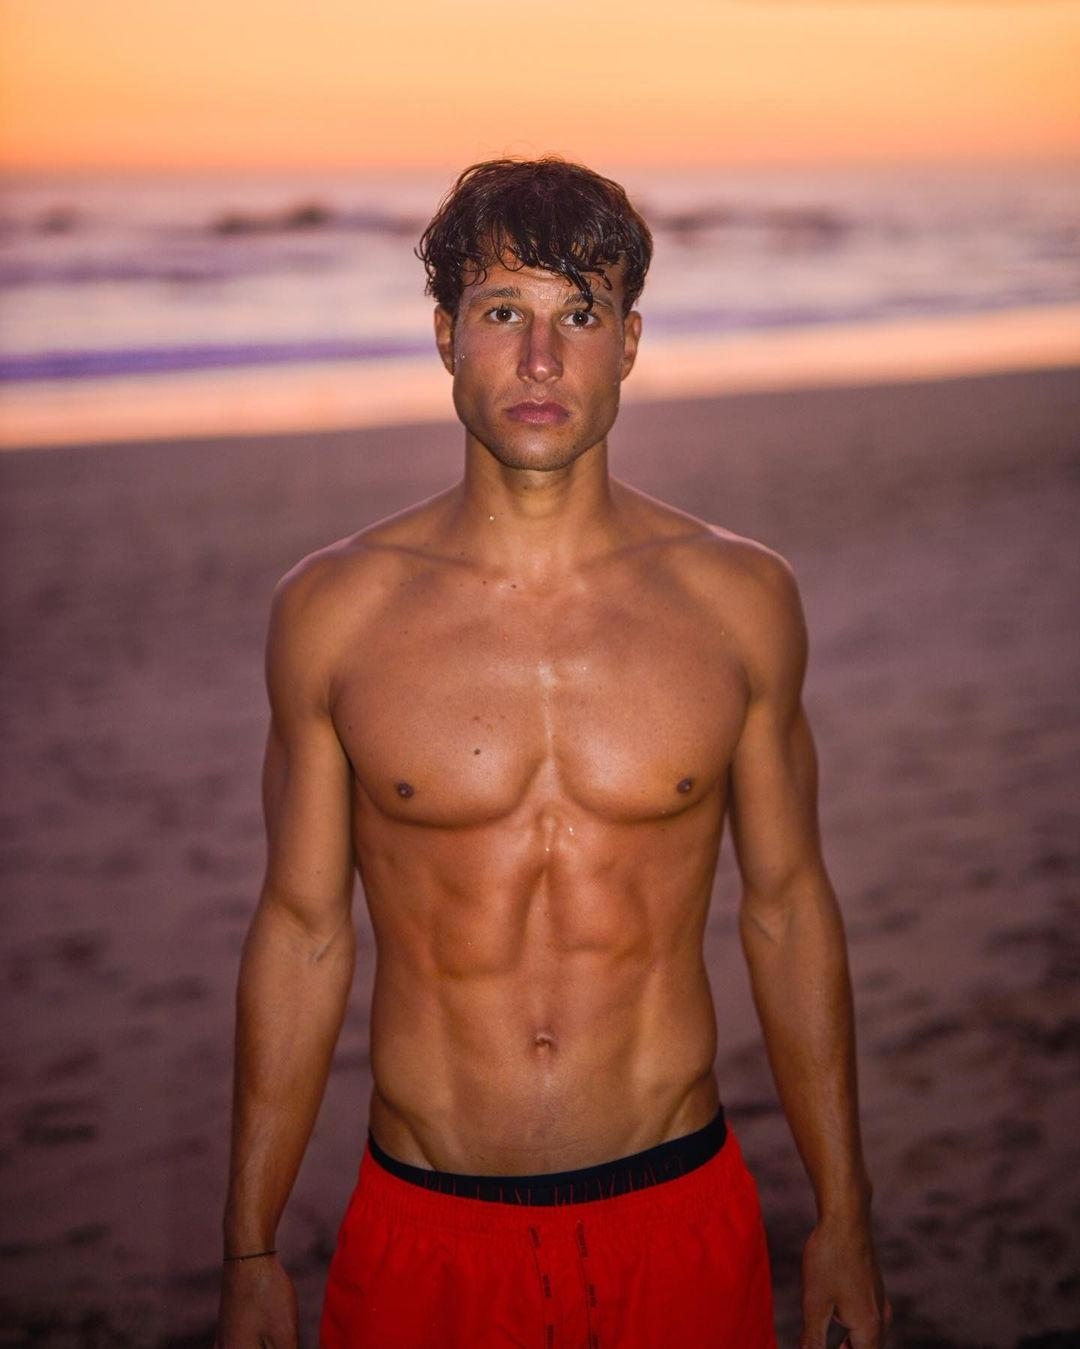 hot-male-models-torben-konig-shirtless-abs-jawline-beach